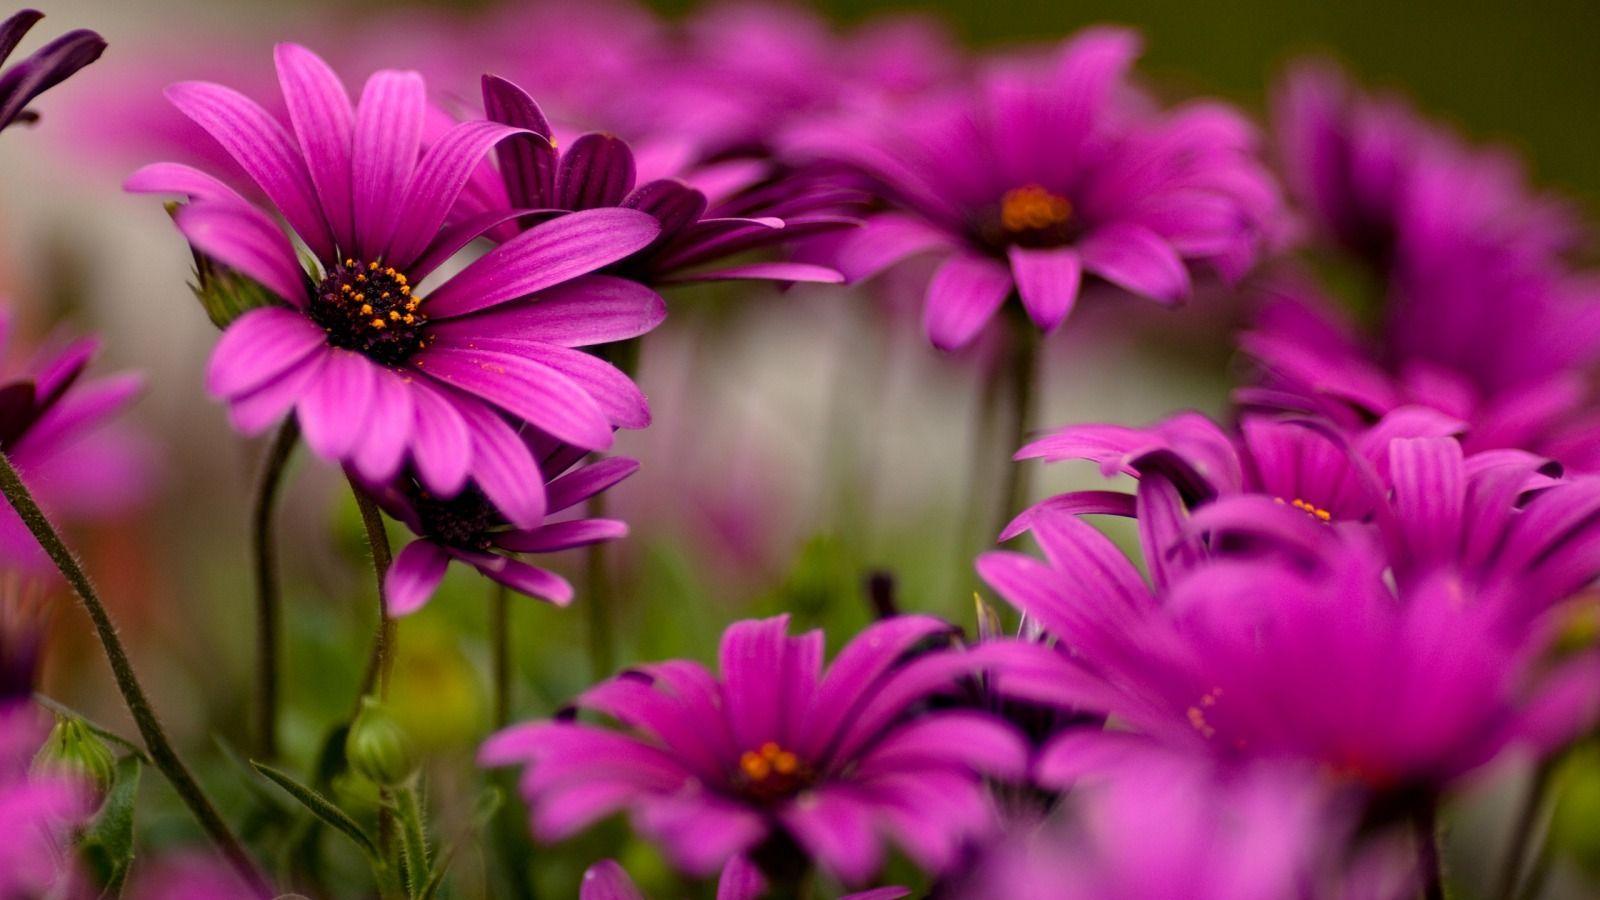 Desktop Flower Backgrounds Group   Data-src /img/252360 - Beautiful Wallpapers Of Flowers - HD Wallpaper